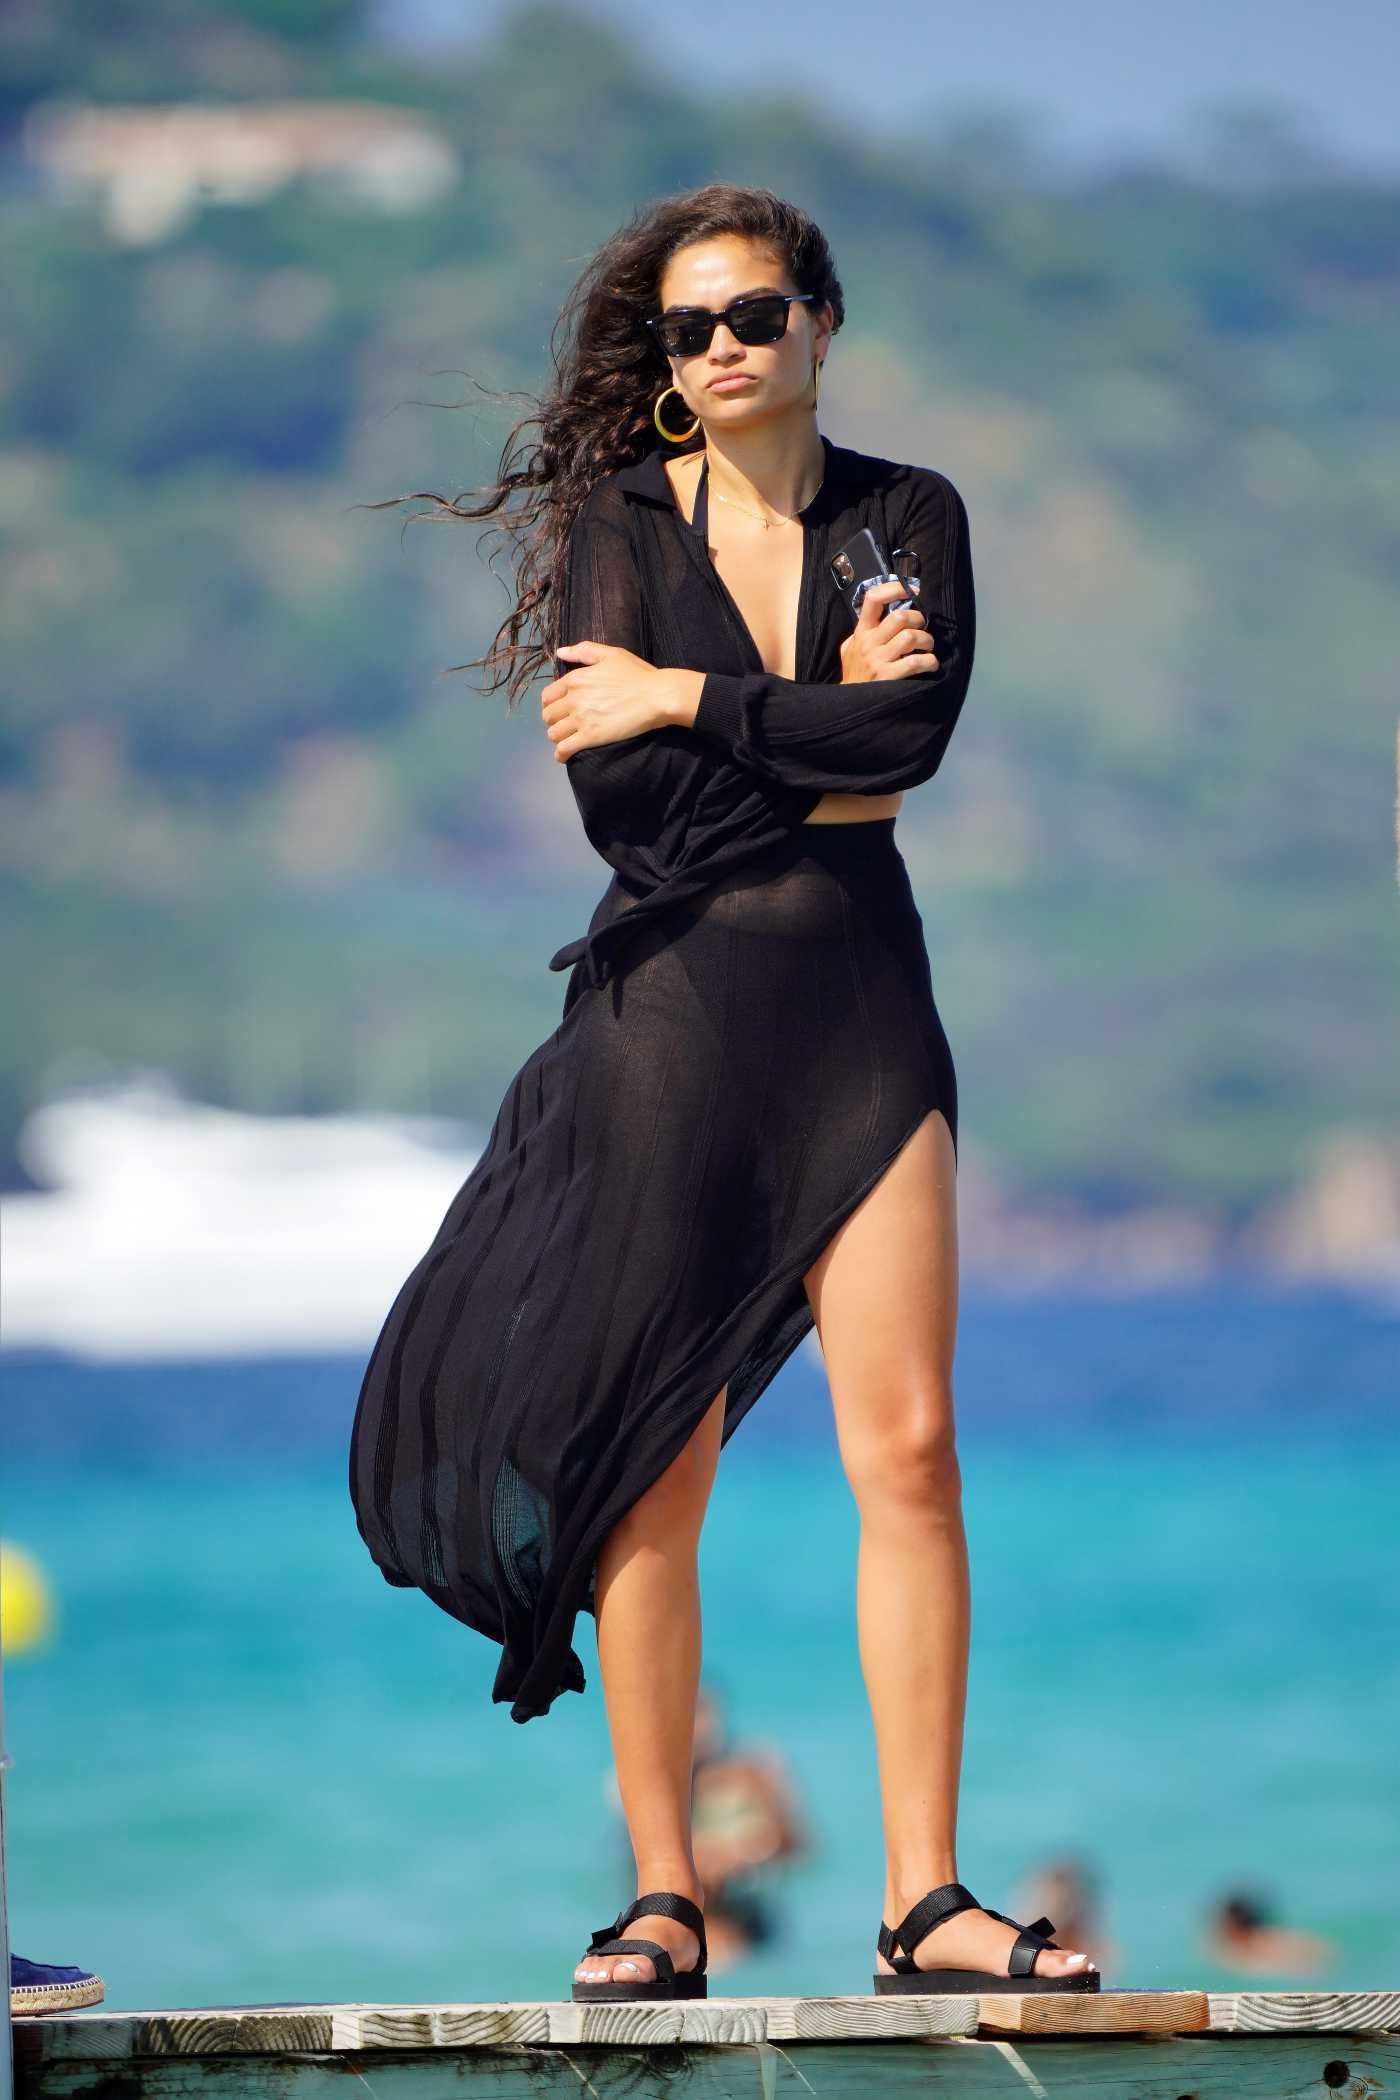 Shanina Shaik in a Black Dress Was Seen with Her Boyfriend Seyed Payam Mirtorabi at Club 55 Beach in St Tropez 07/23/2020